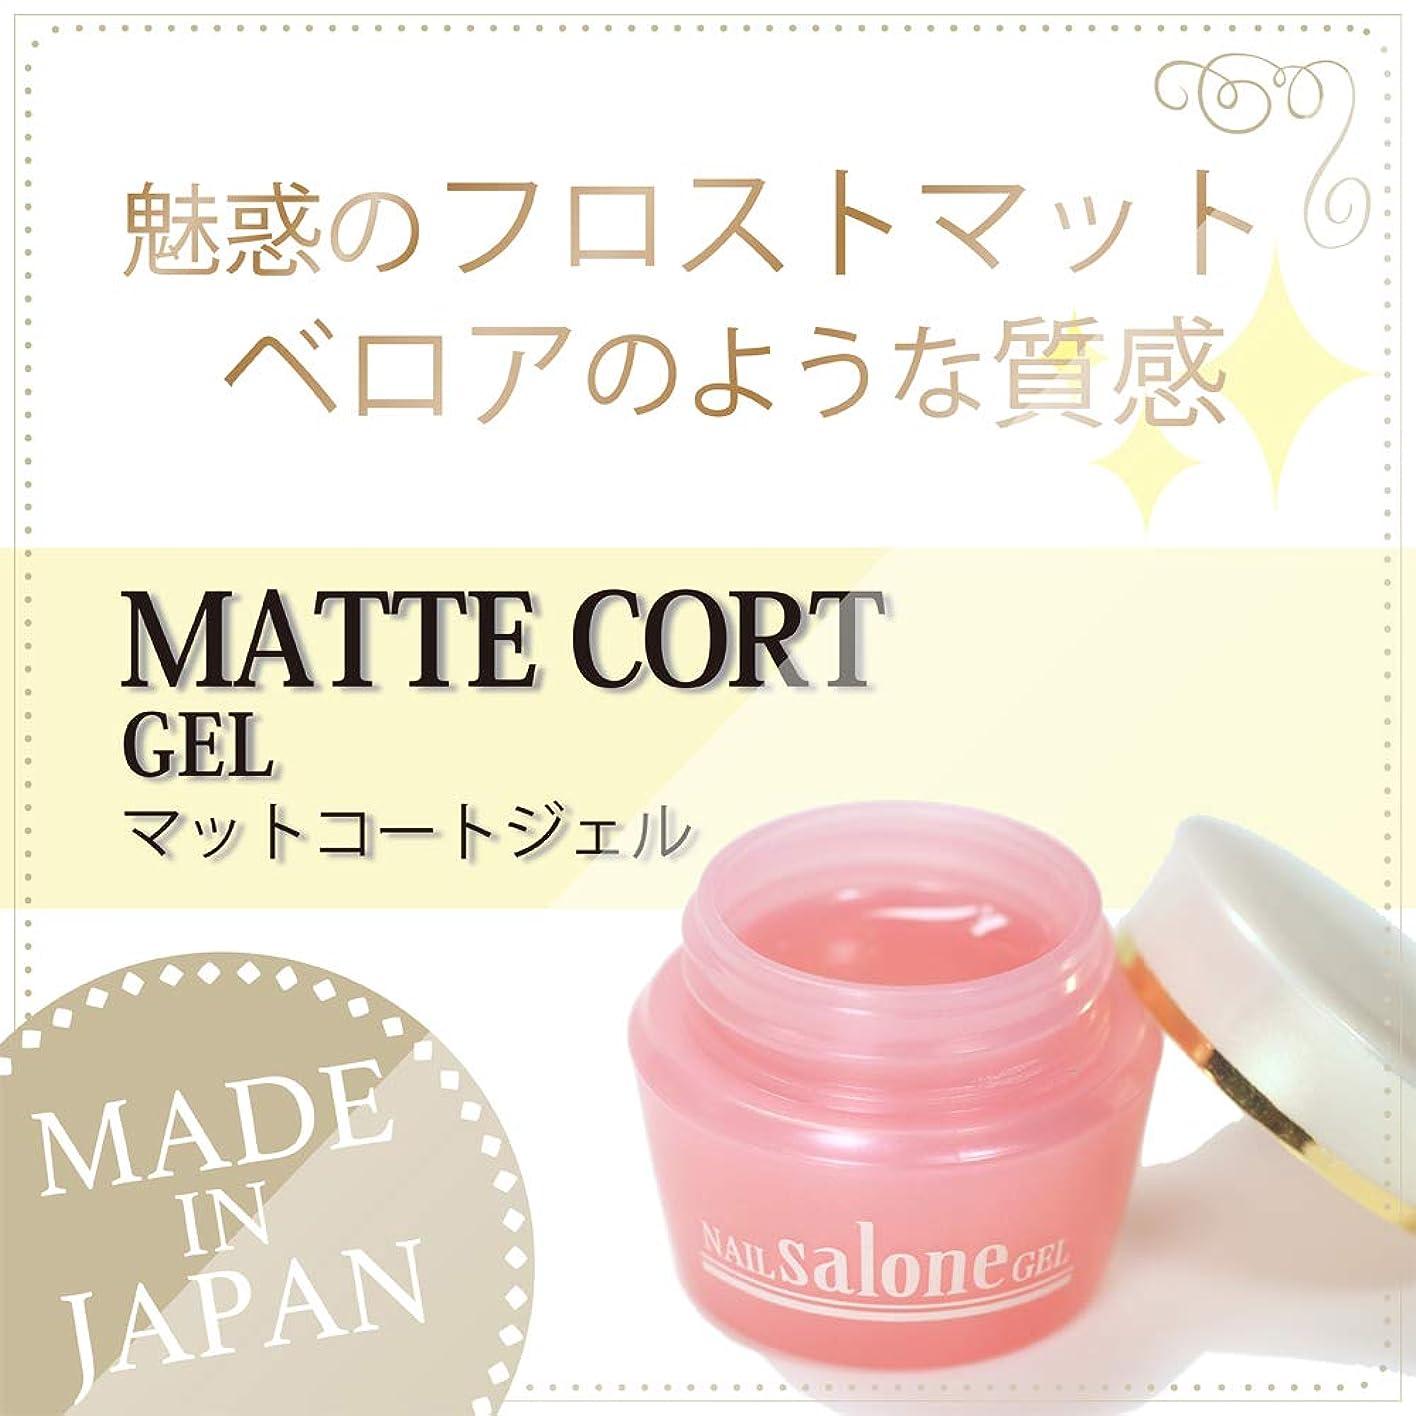 Salone マットコートジェル 3g